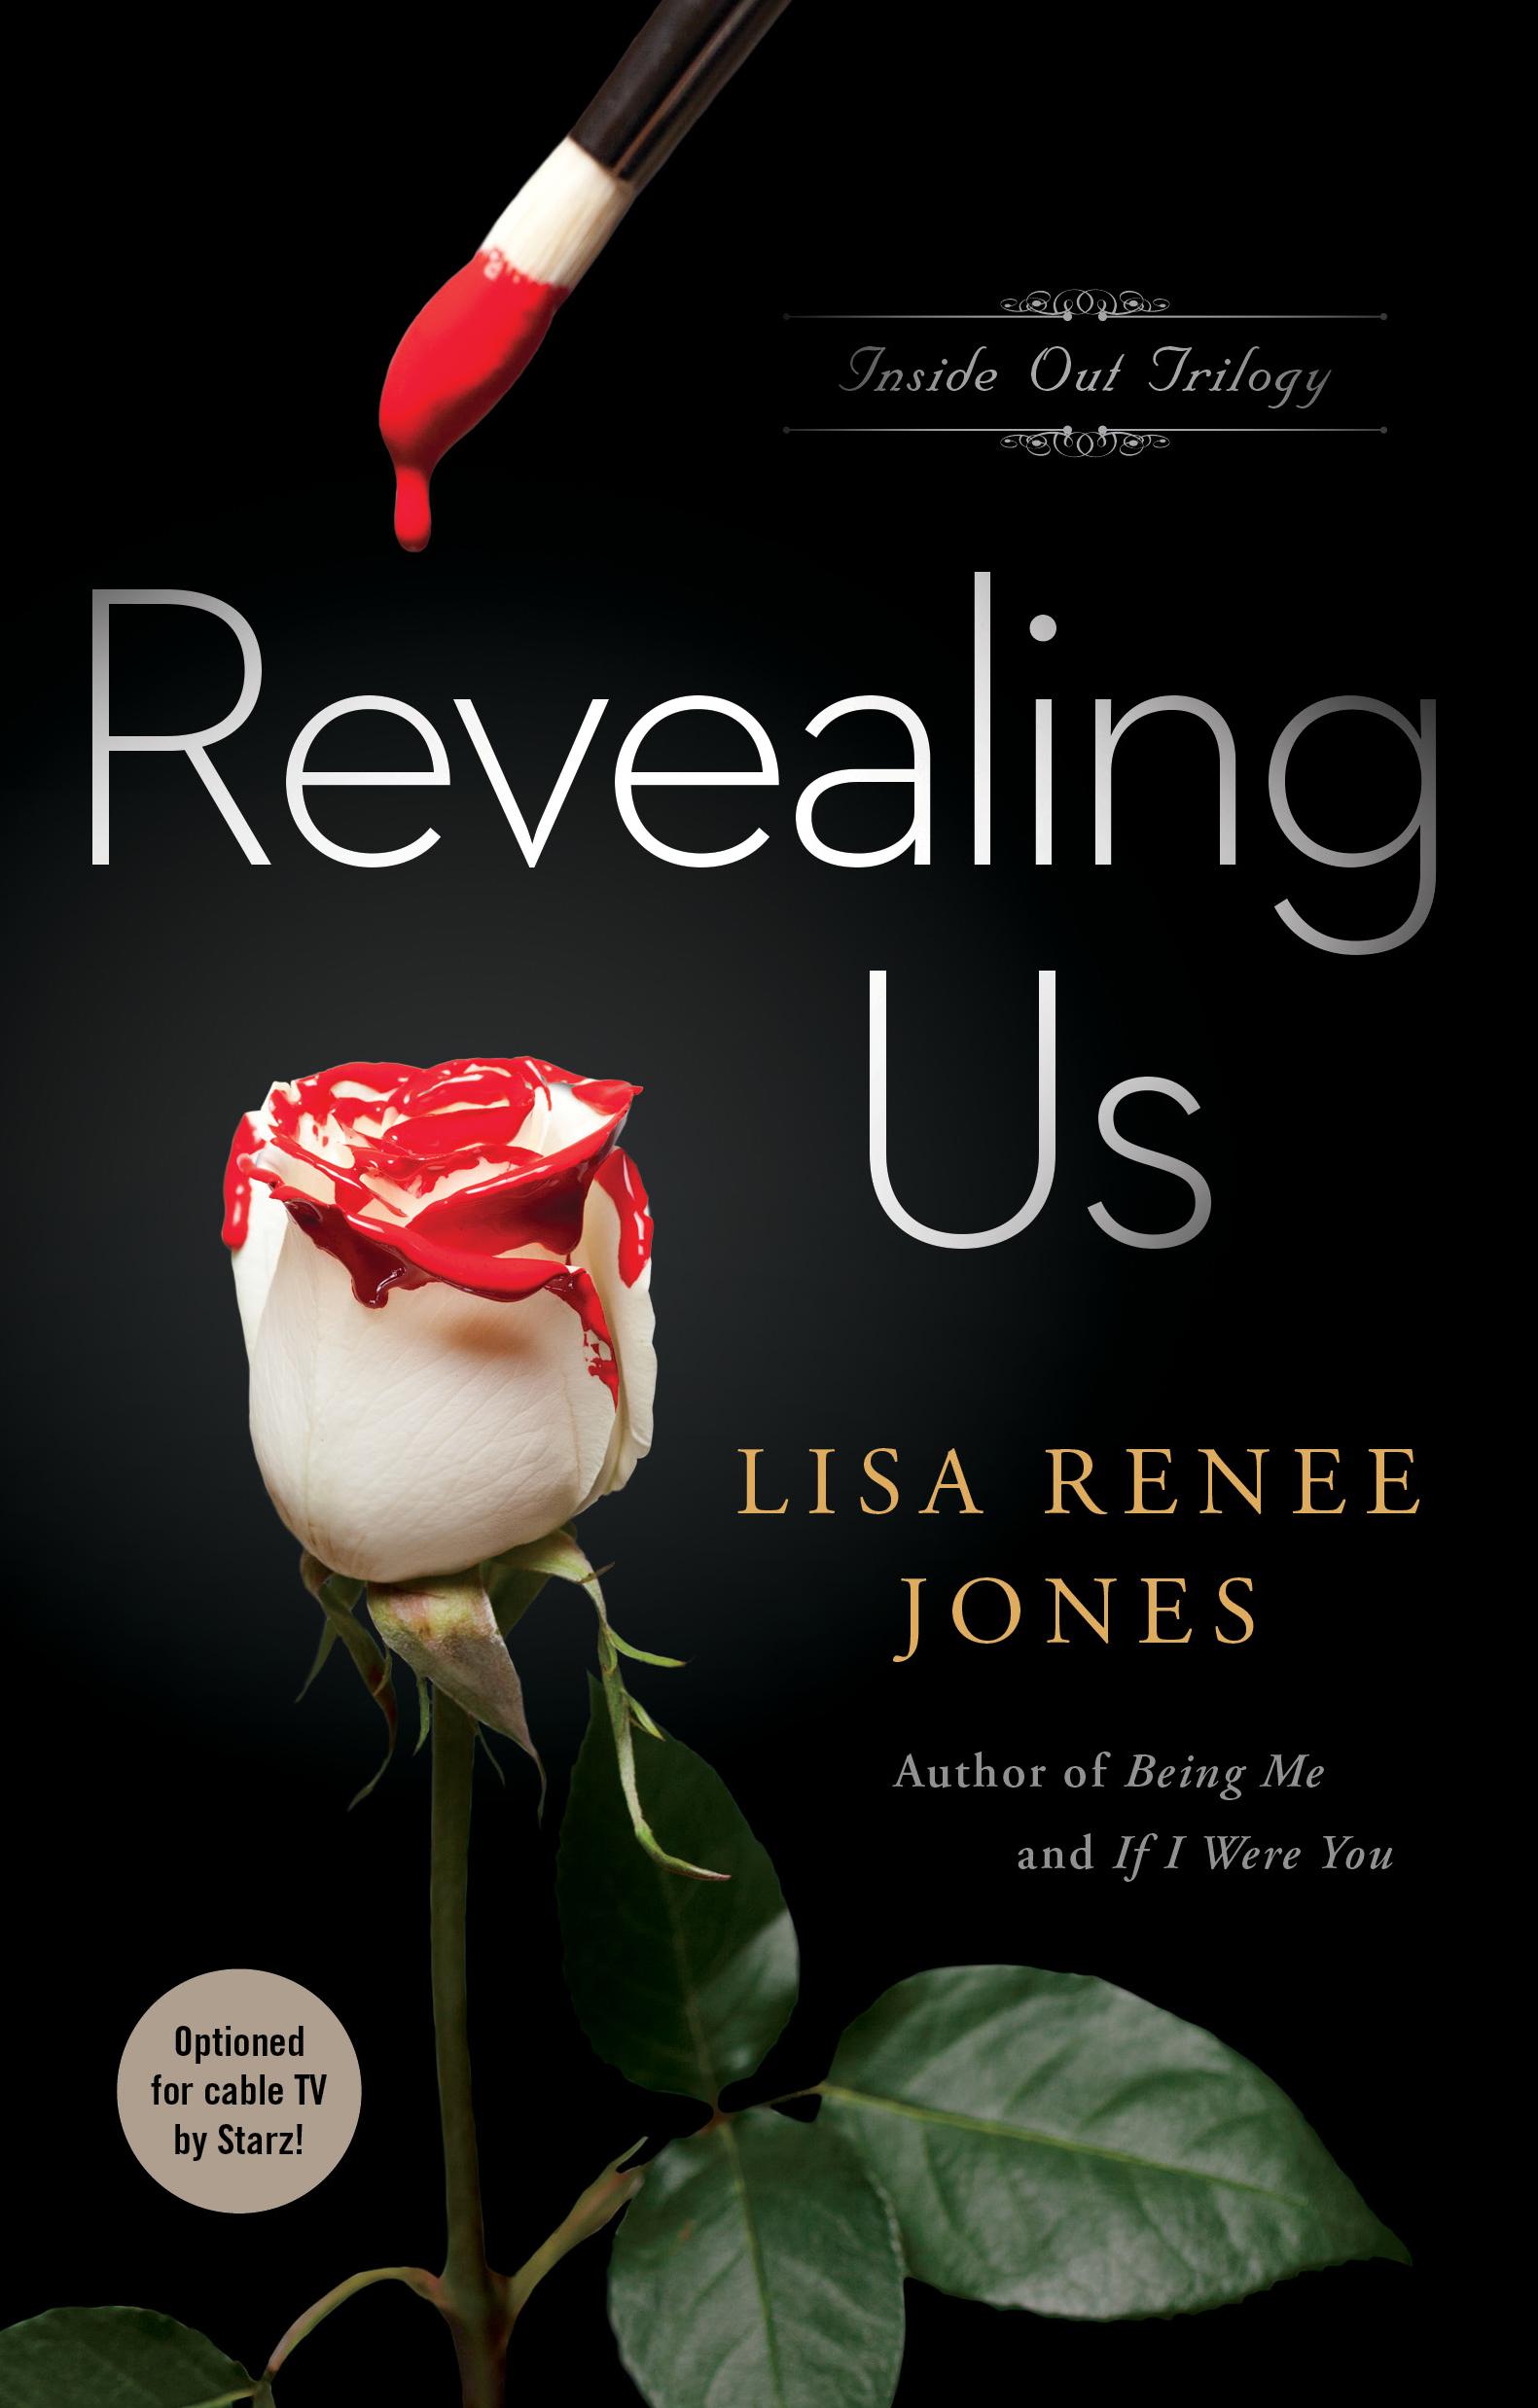 Revealing Us - Lisa Renee Jones